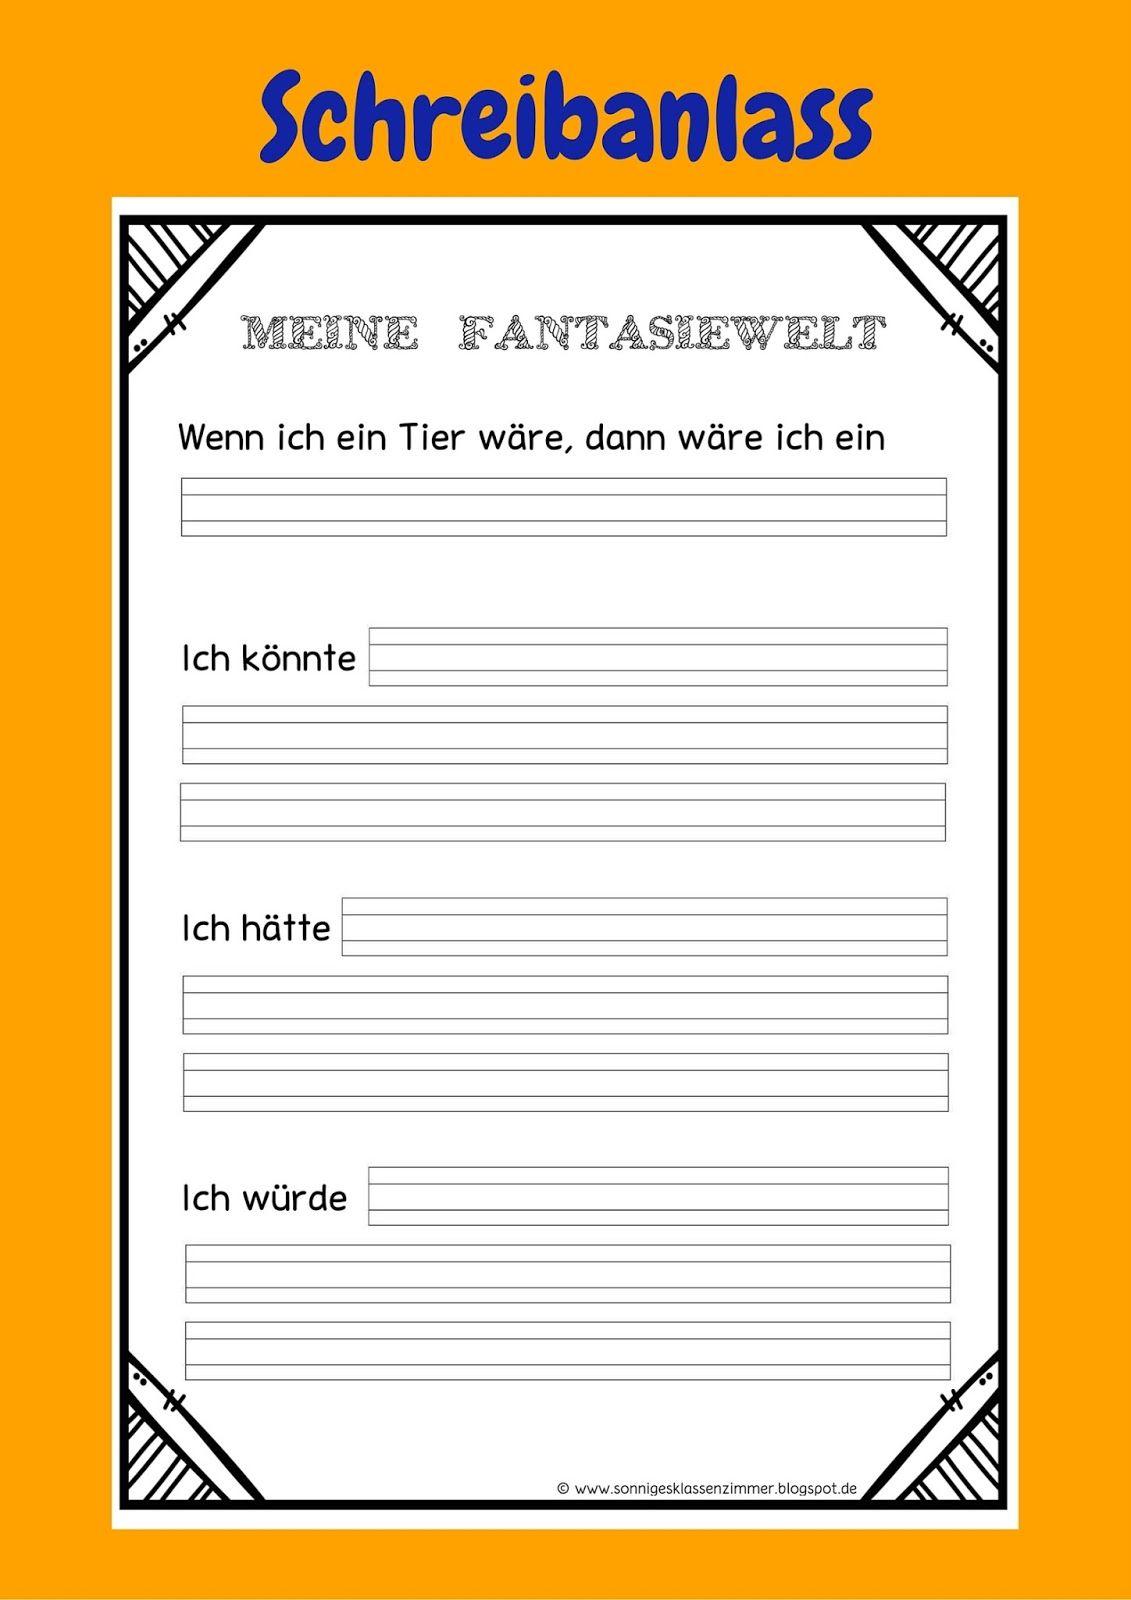 Meine Fantasiewelt Schreibanlass Klasse 1, Klasse 2 Deutsch | daz ...